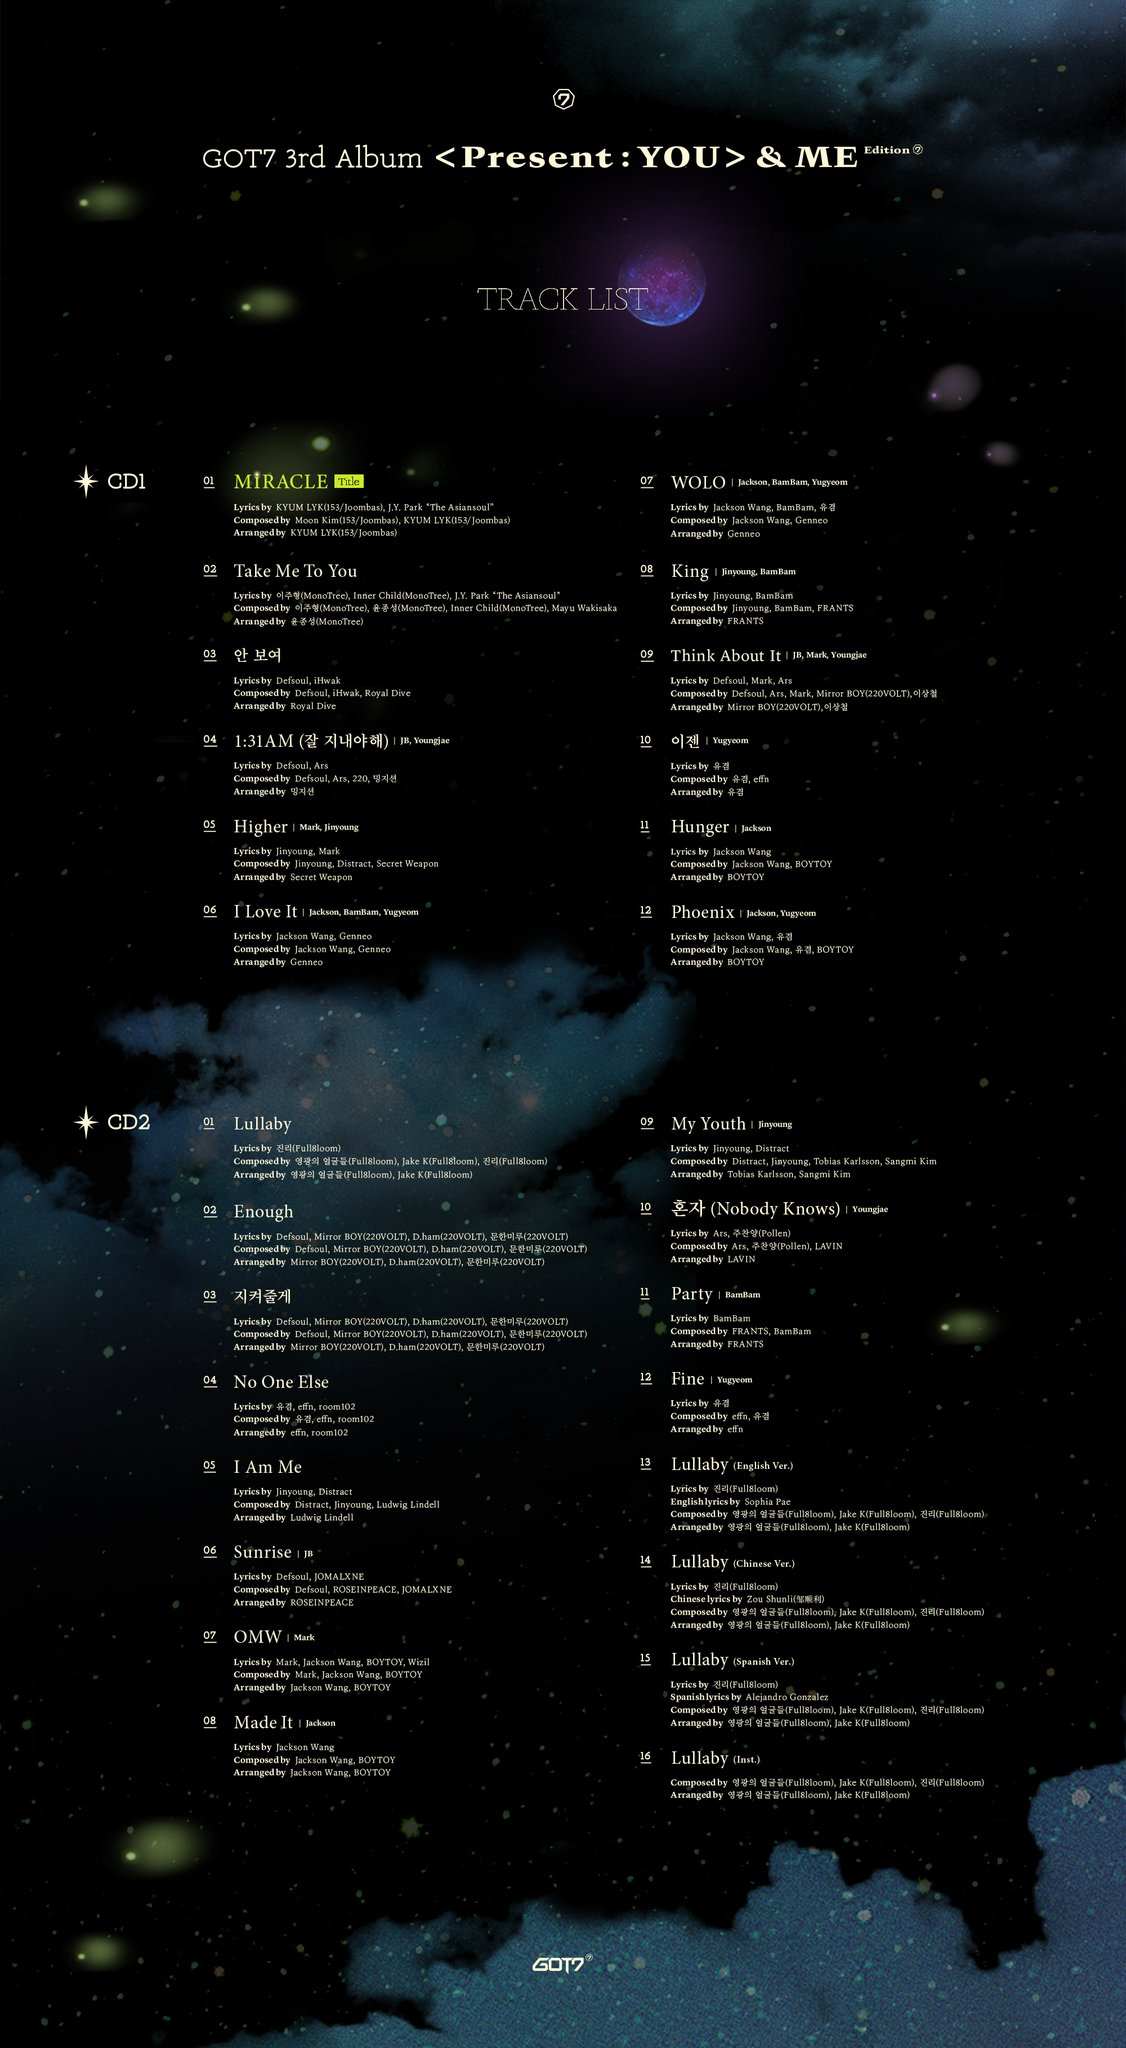 got7-present-track-list.jpg